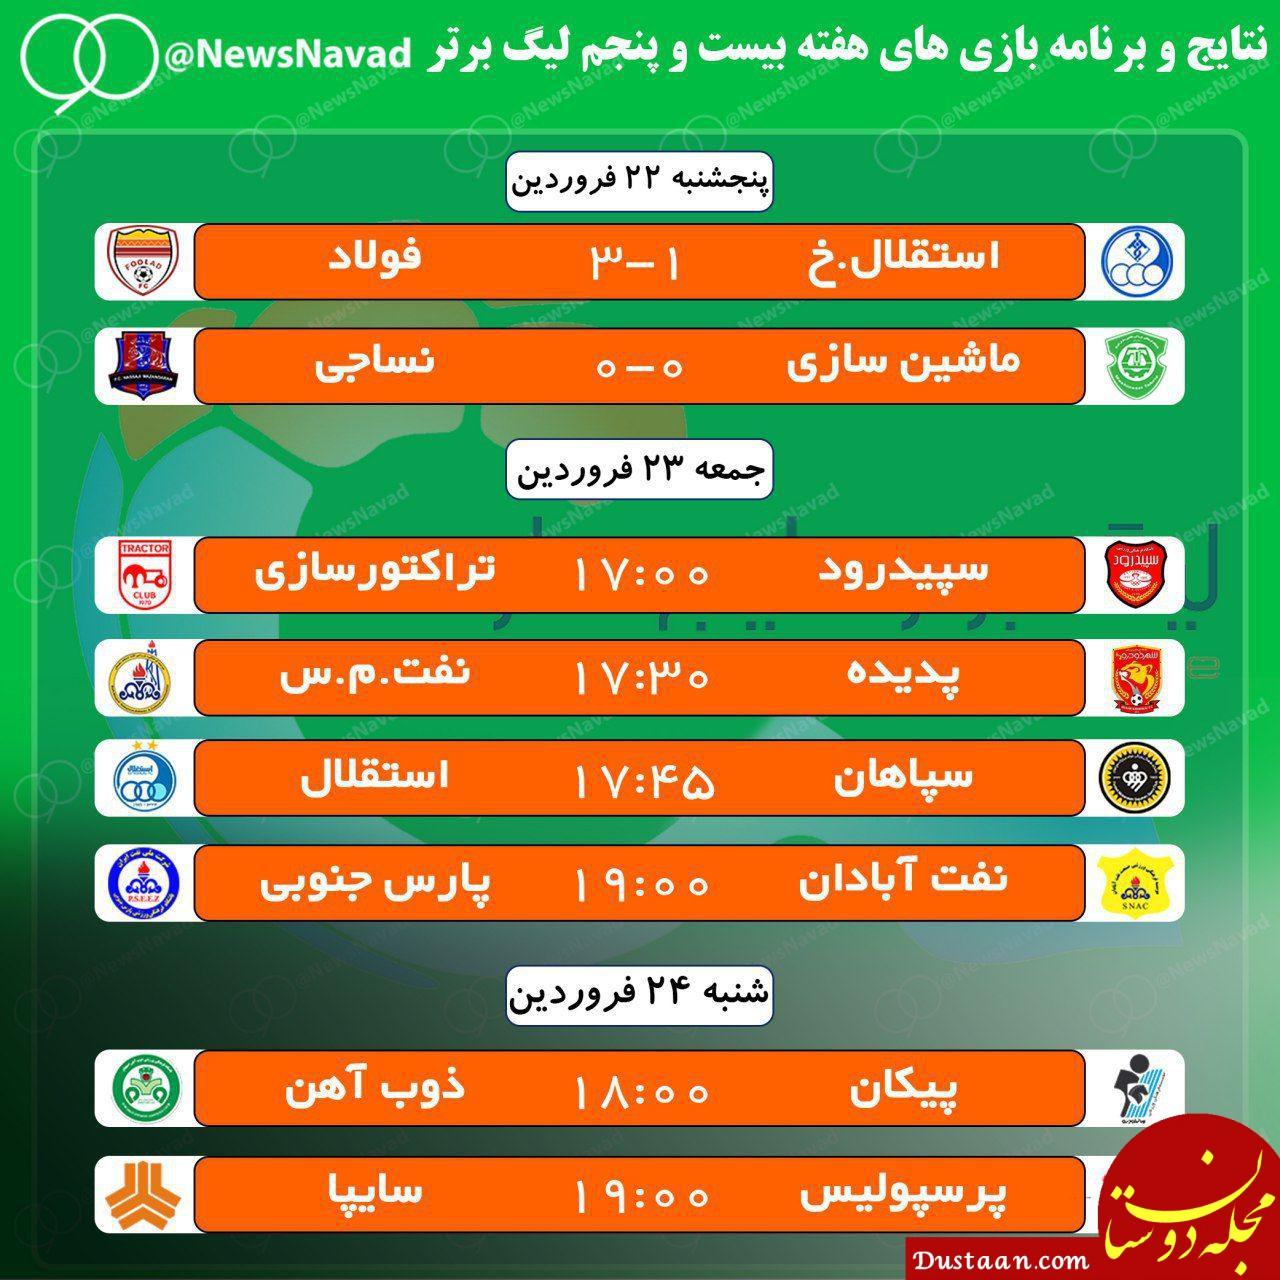 www.dustaan.com نتایج و برنامه بازی های هفته بیست و پنجم لیگ برتر